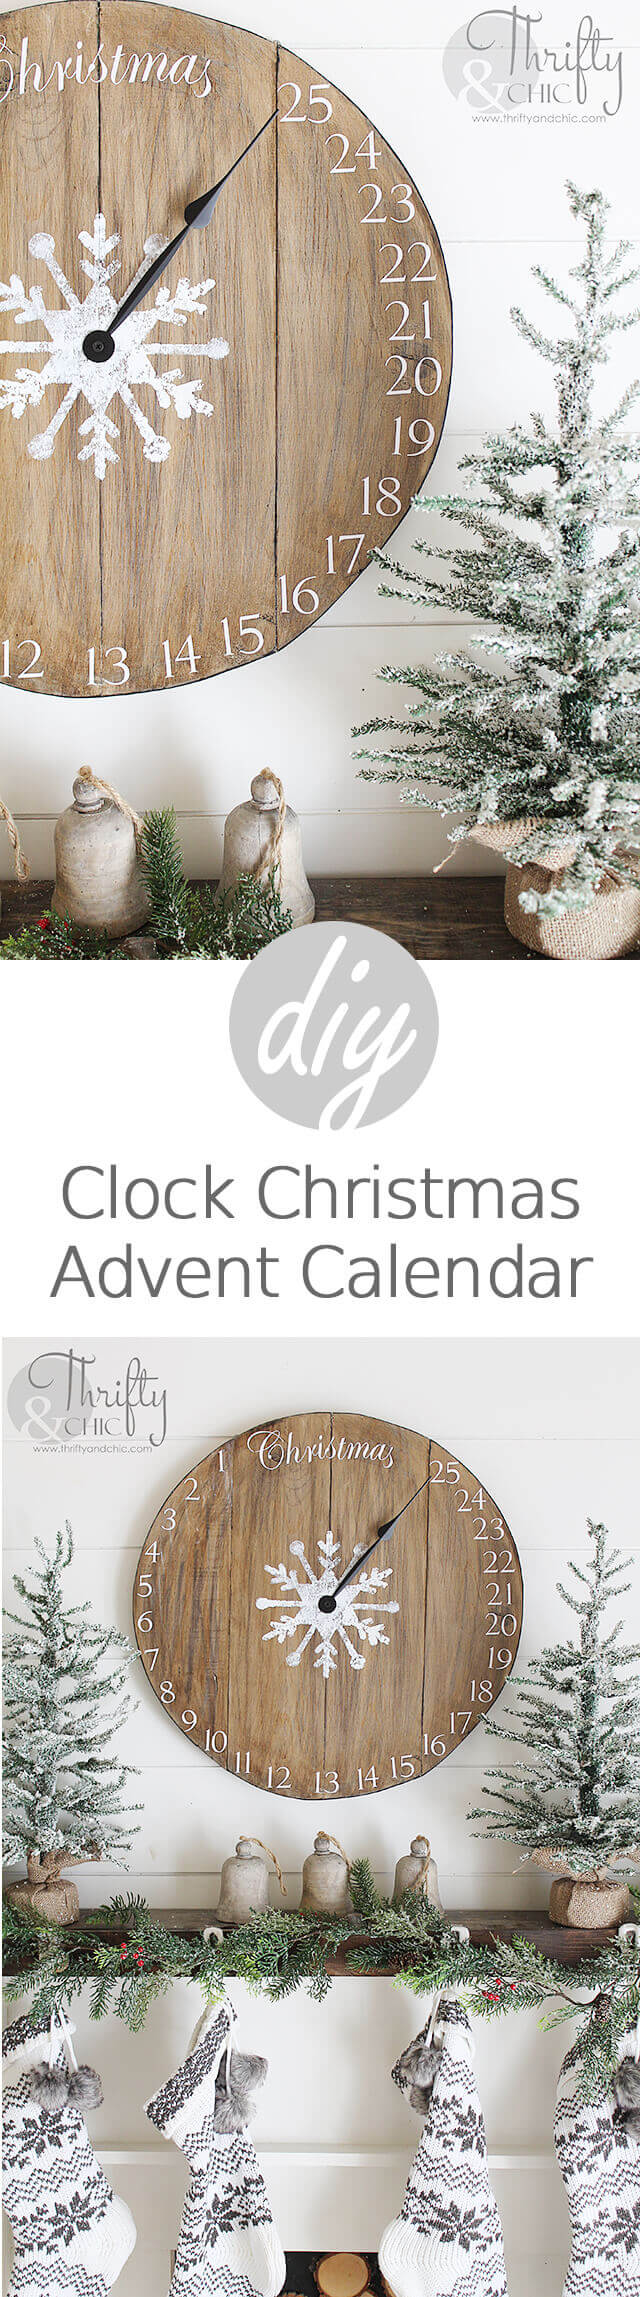 DIY Christmas Clock Advent Calendar